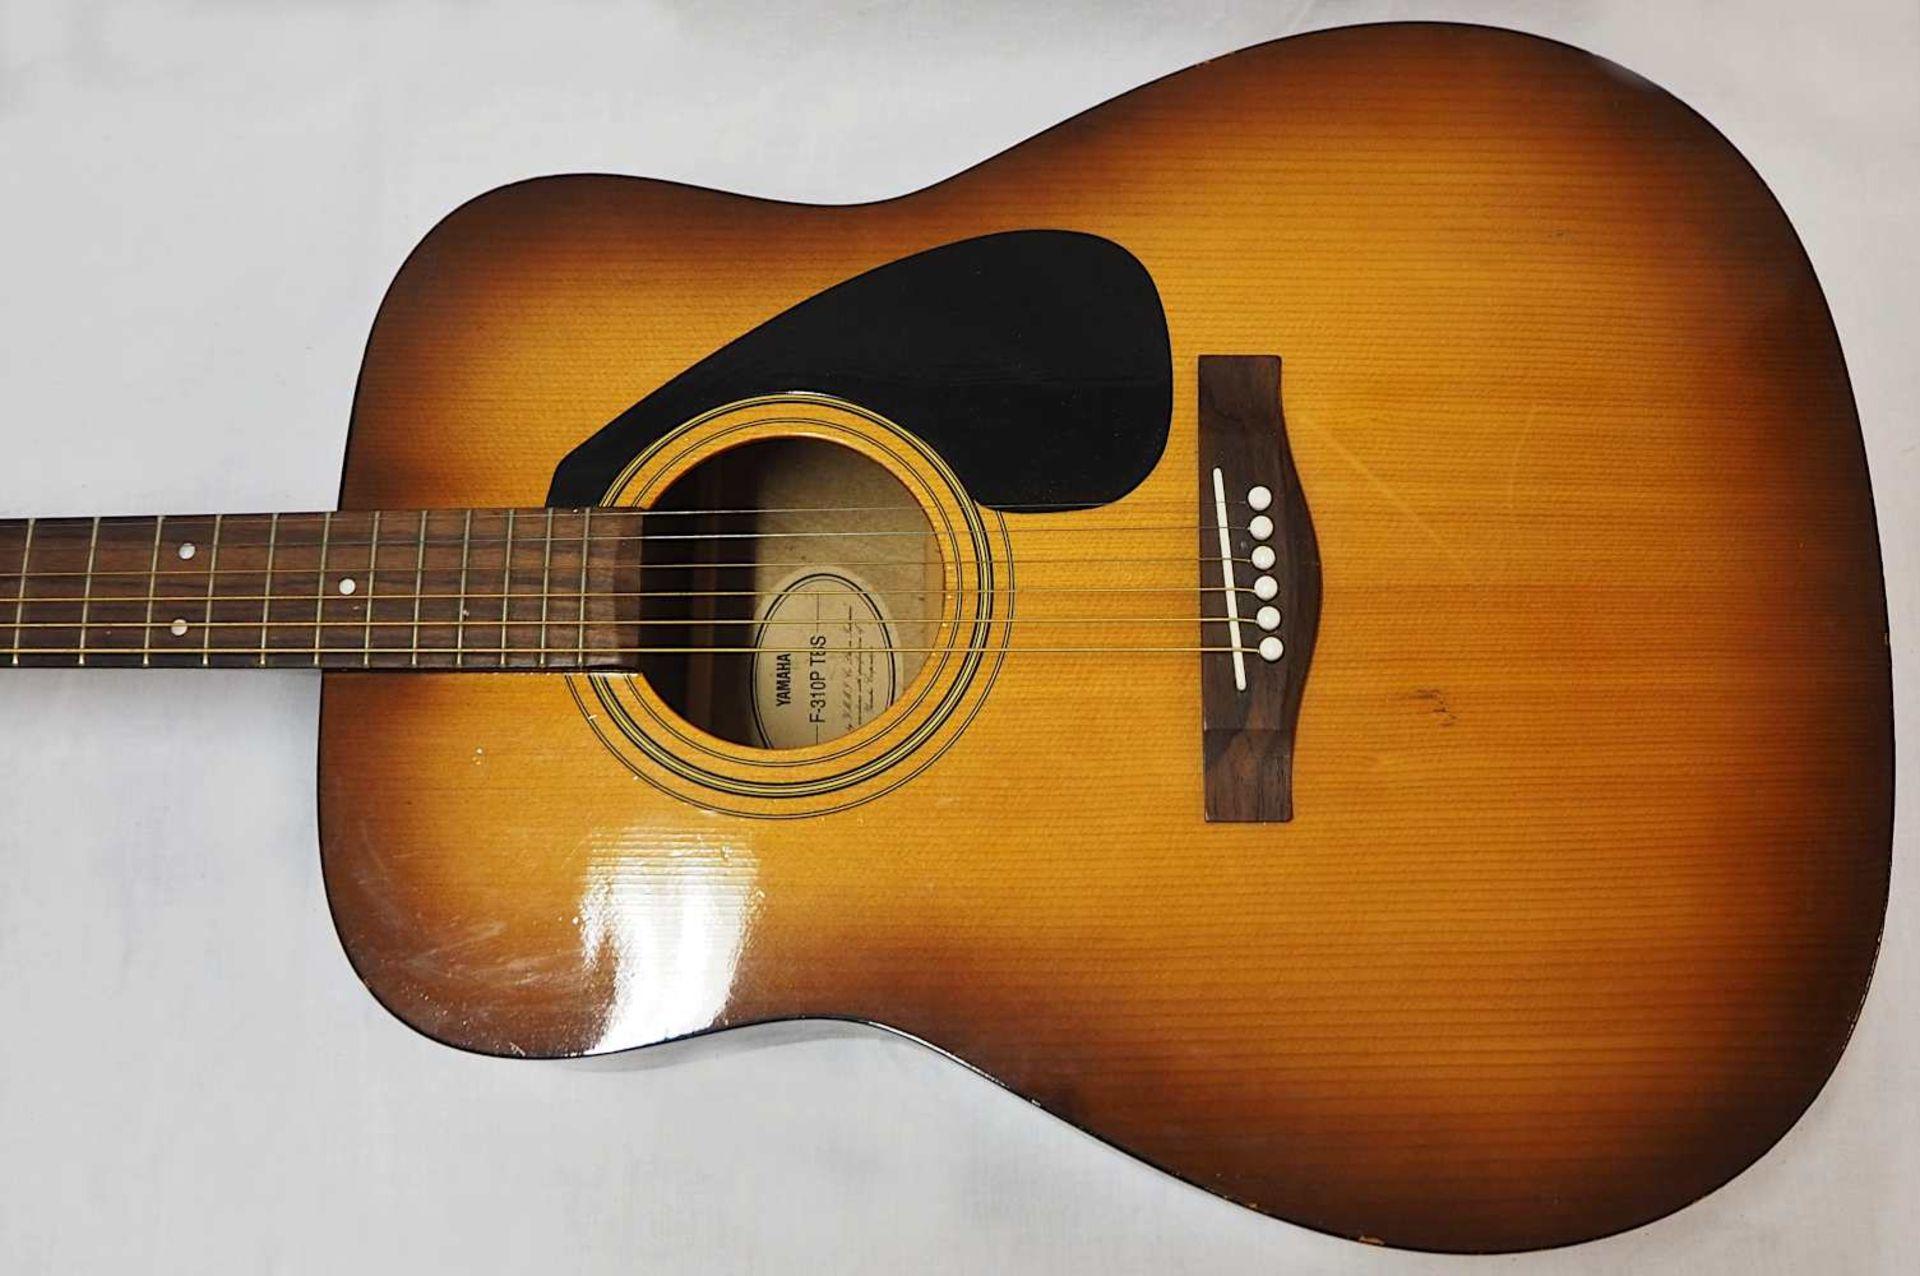 "1 Westerngitarre YAMAHA Modell: ""F-310P TBS, YMMJ Co. Ldt.,"" Indonesien Holzkorpus mit - Bild 4 aus 6"